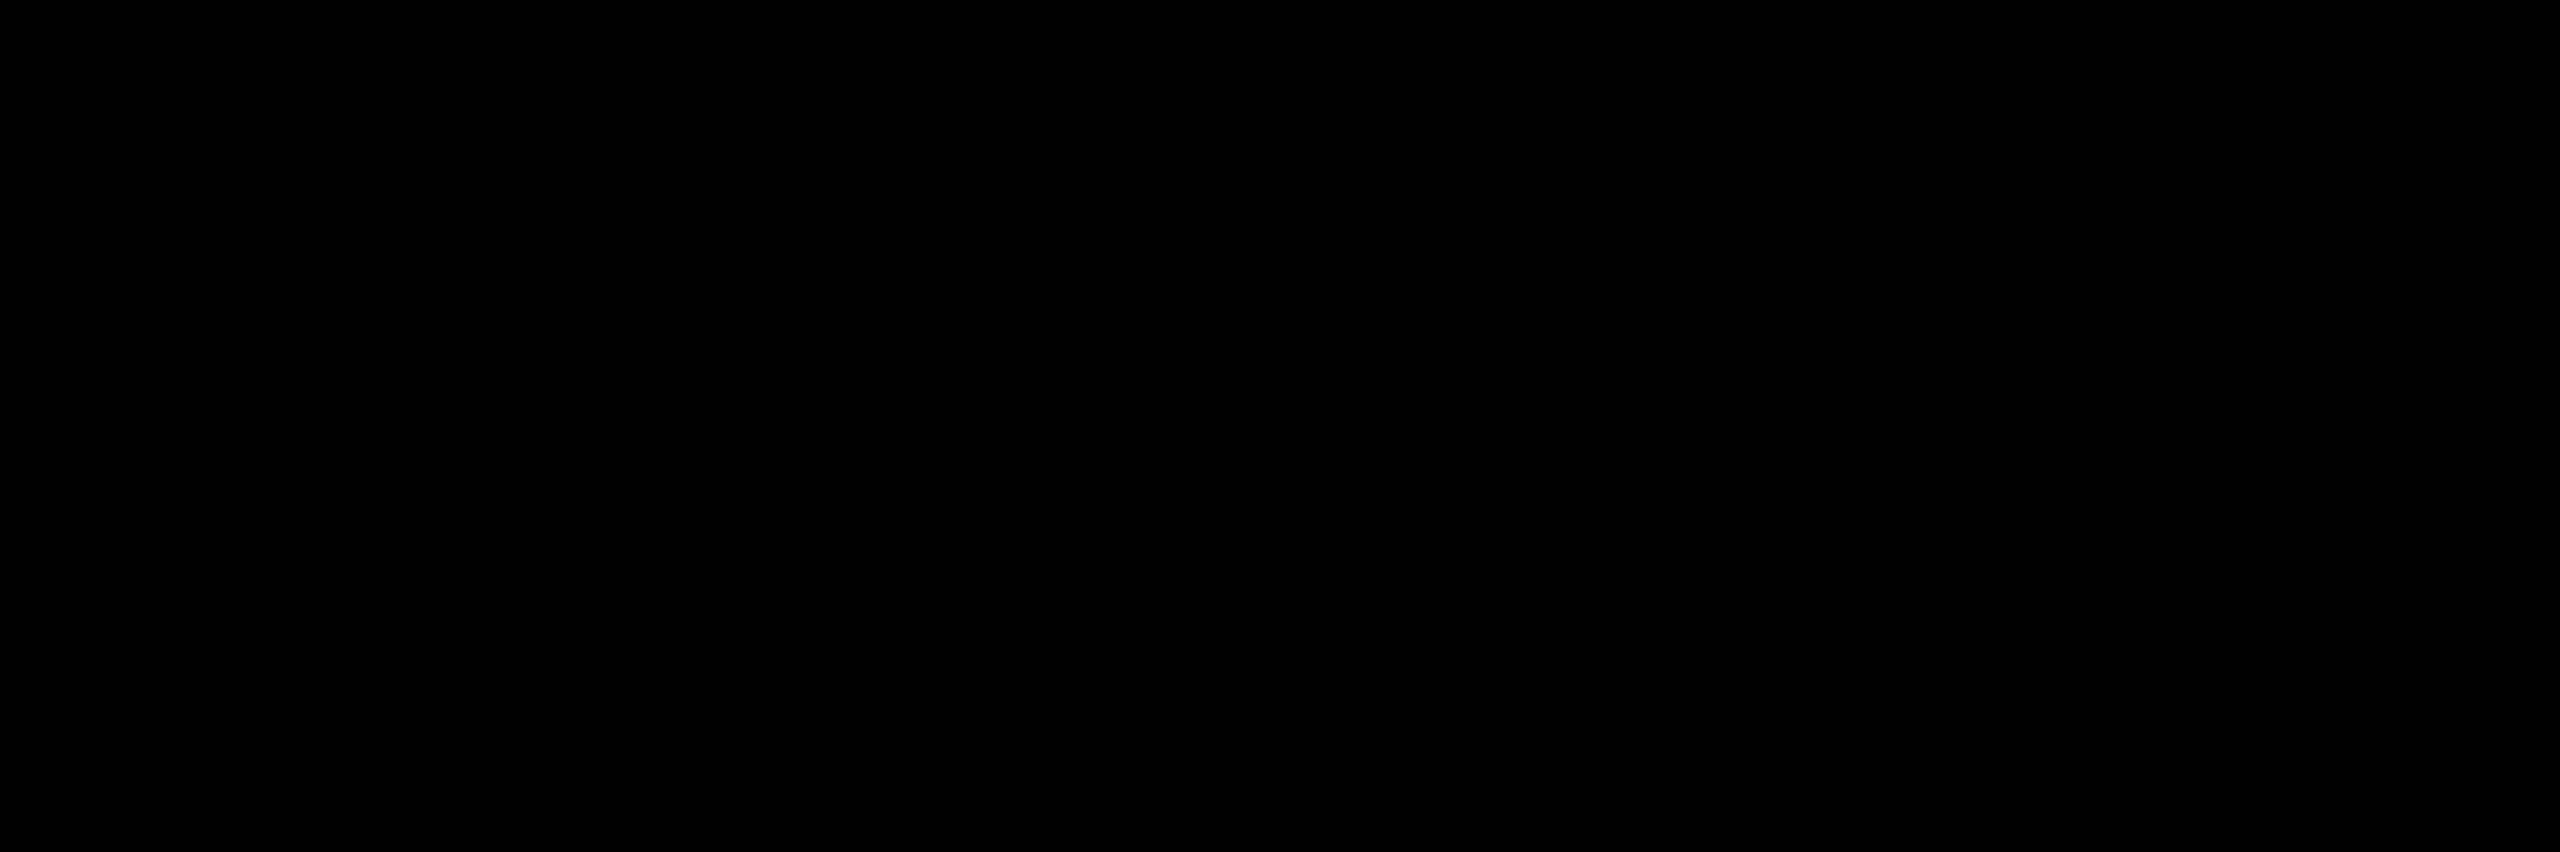 Coronaspelregels vanaf 1 juli 2020